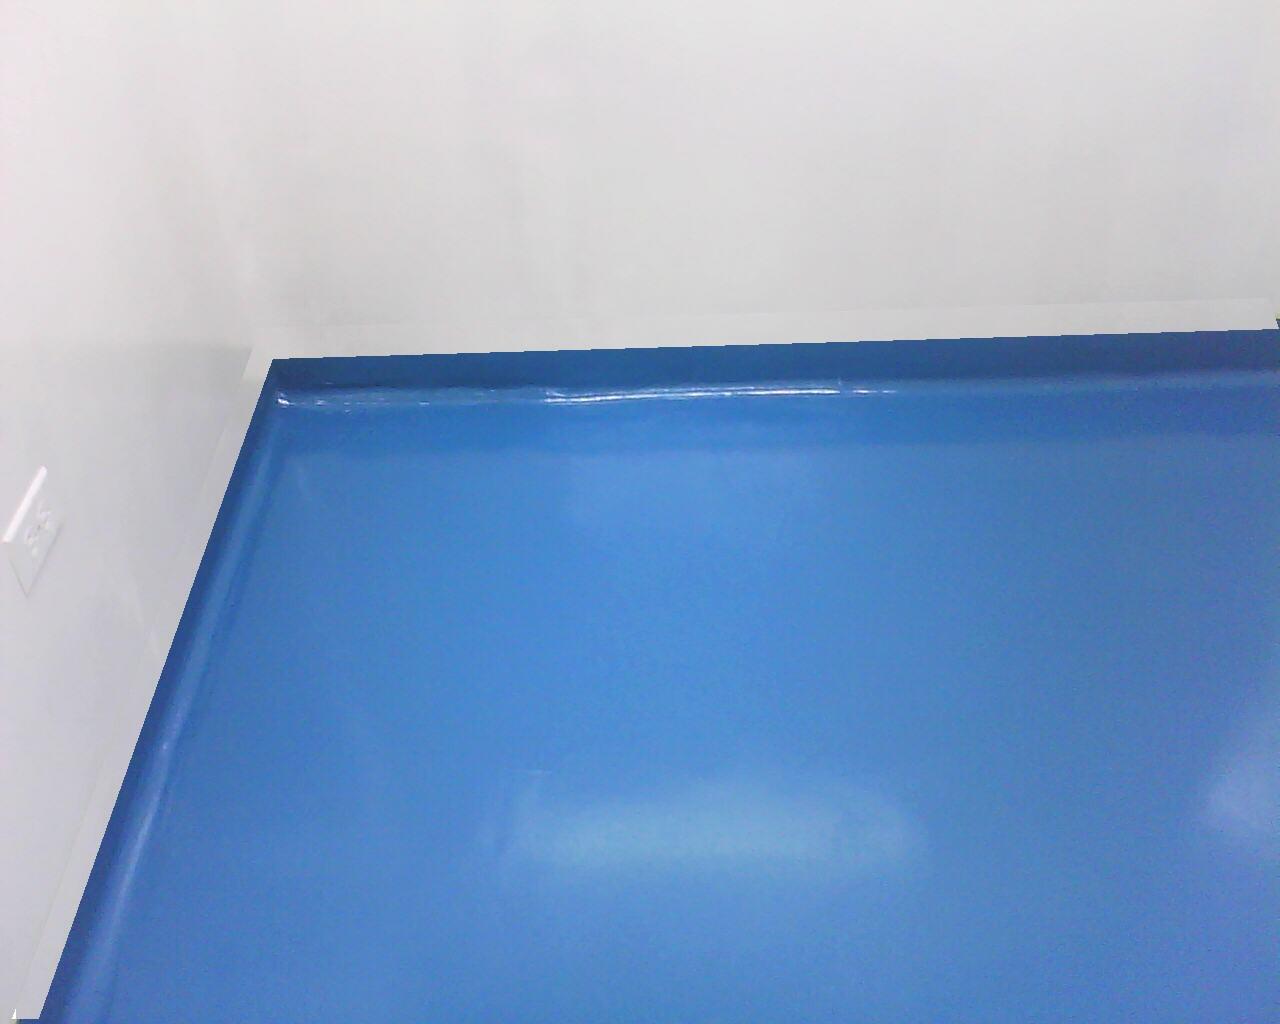 Pintar con pintura epoxica remodelaciones - Pintura para pintar piso de cemento ...